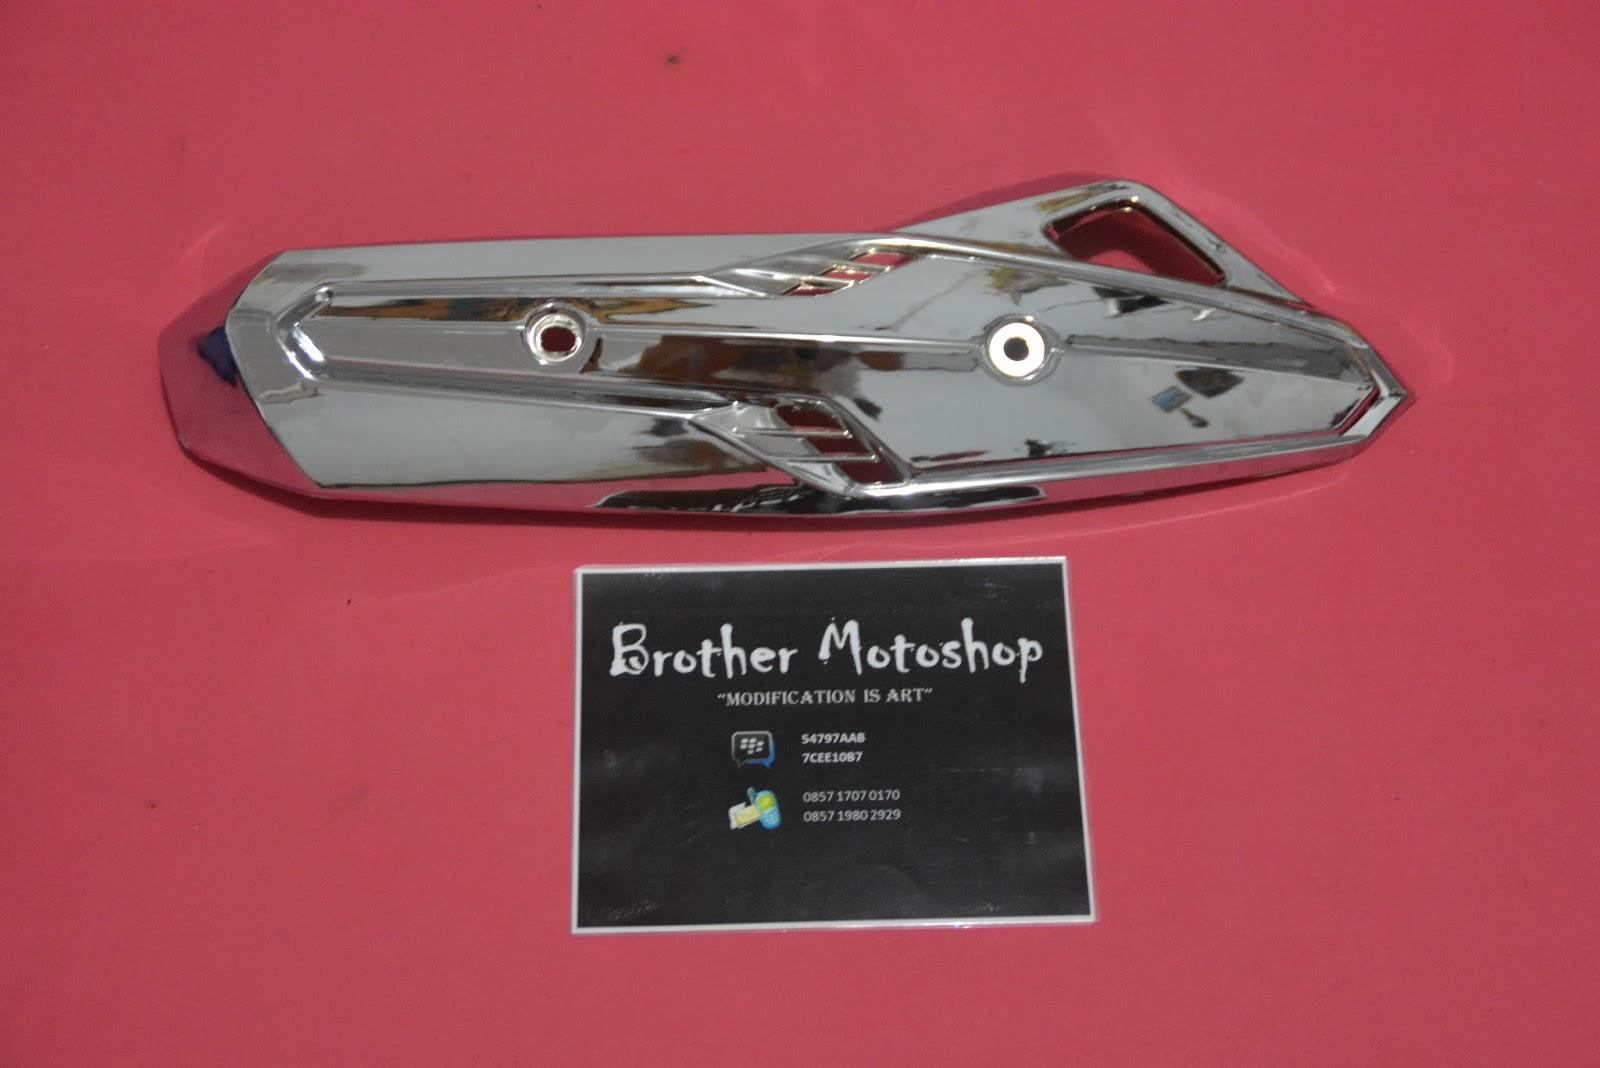 Brother Motoshop Cover Tutup Knalpot Honda Vario 125 Chrome Techno Led 150